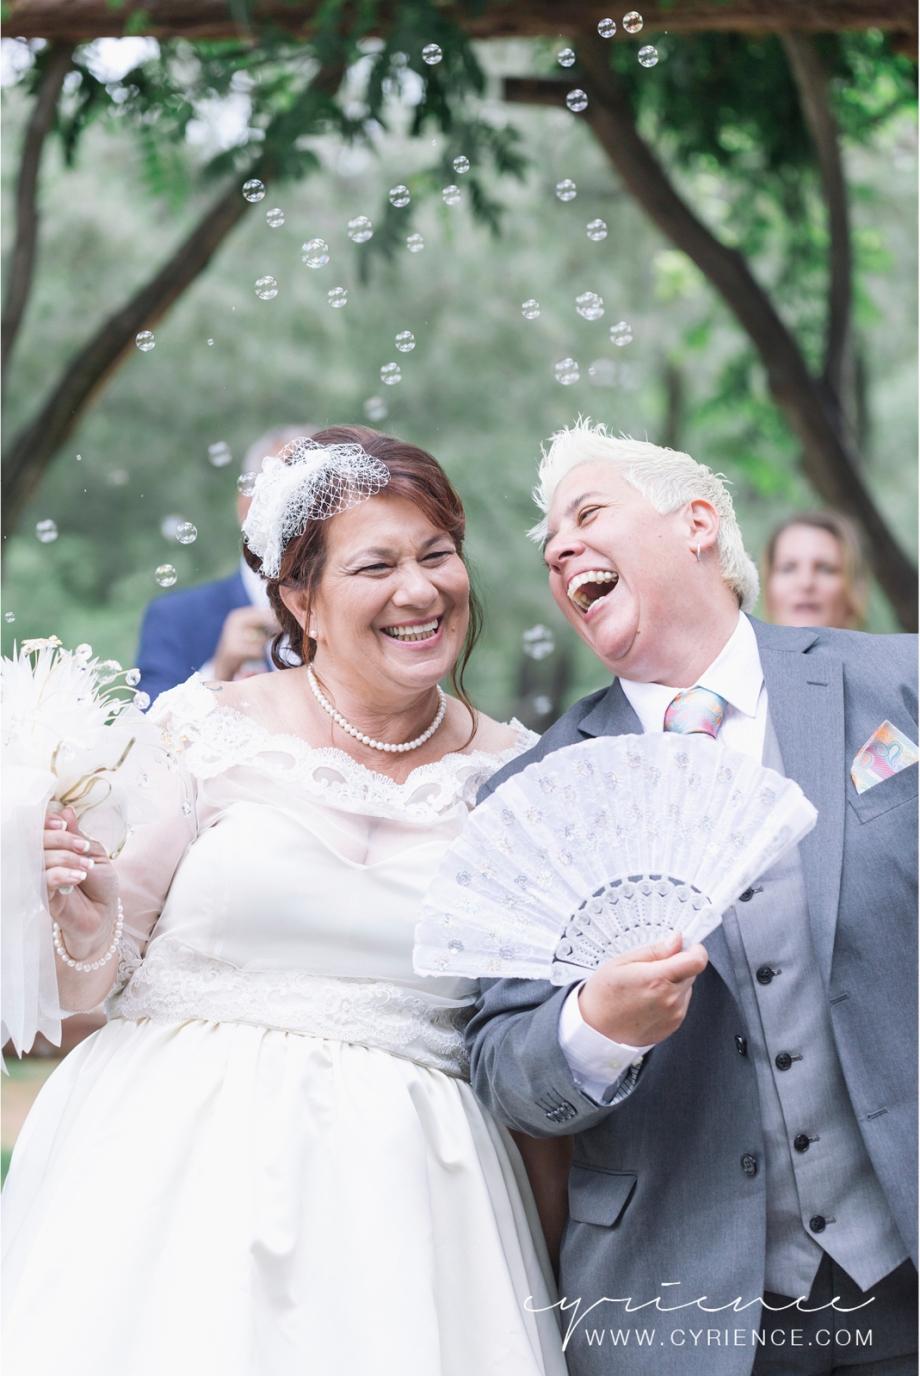 New York City Central Park Summer Wedding / Elopement